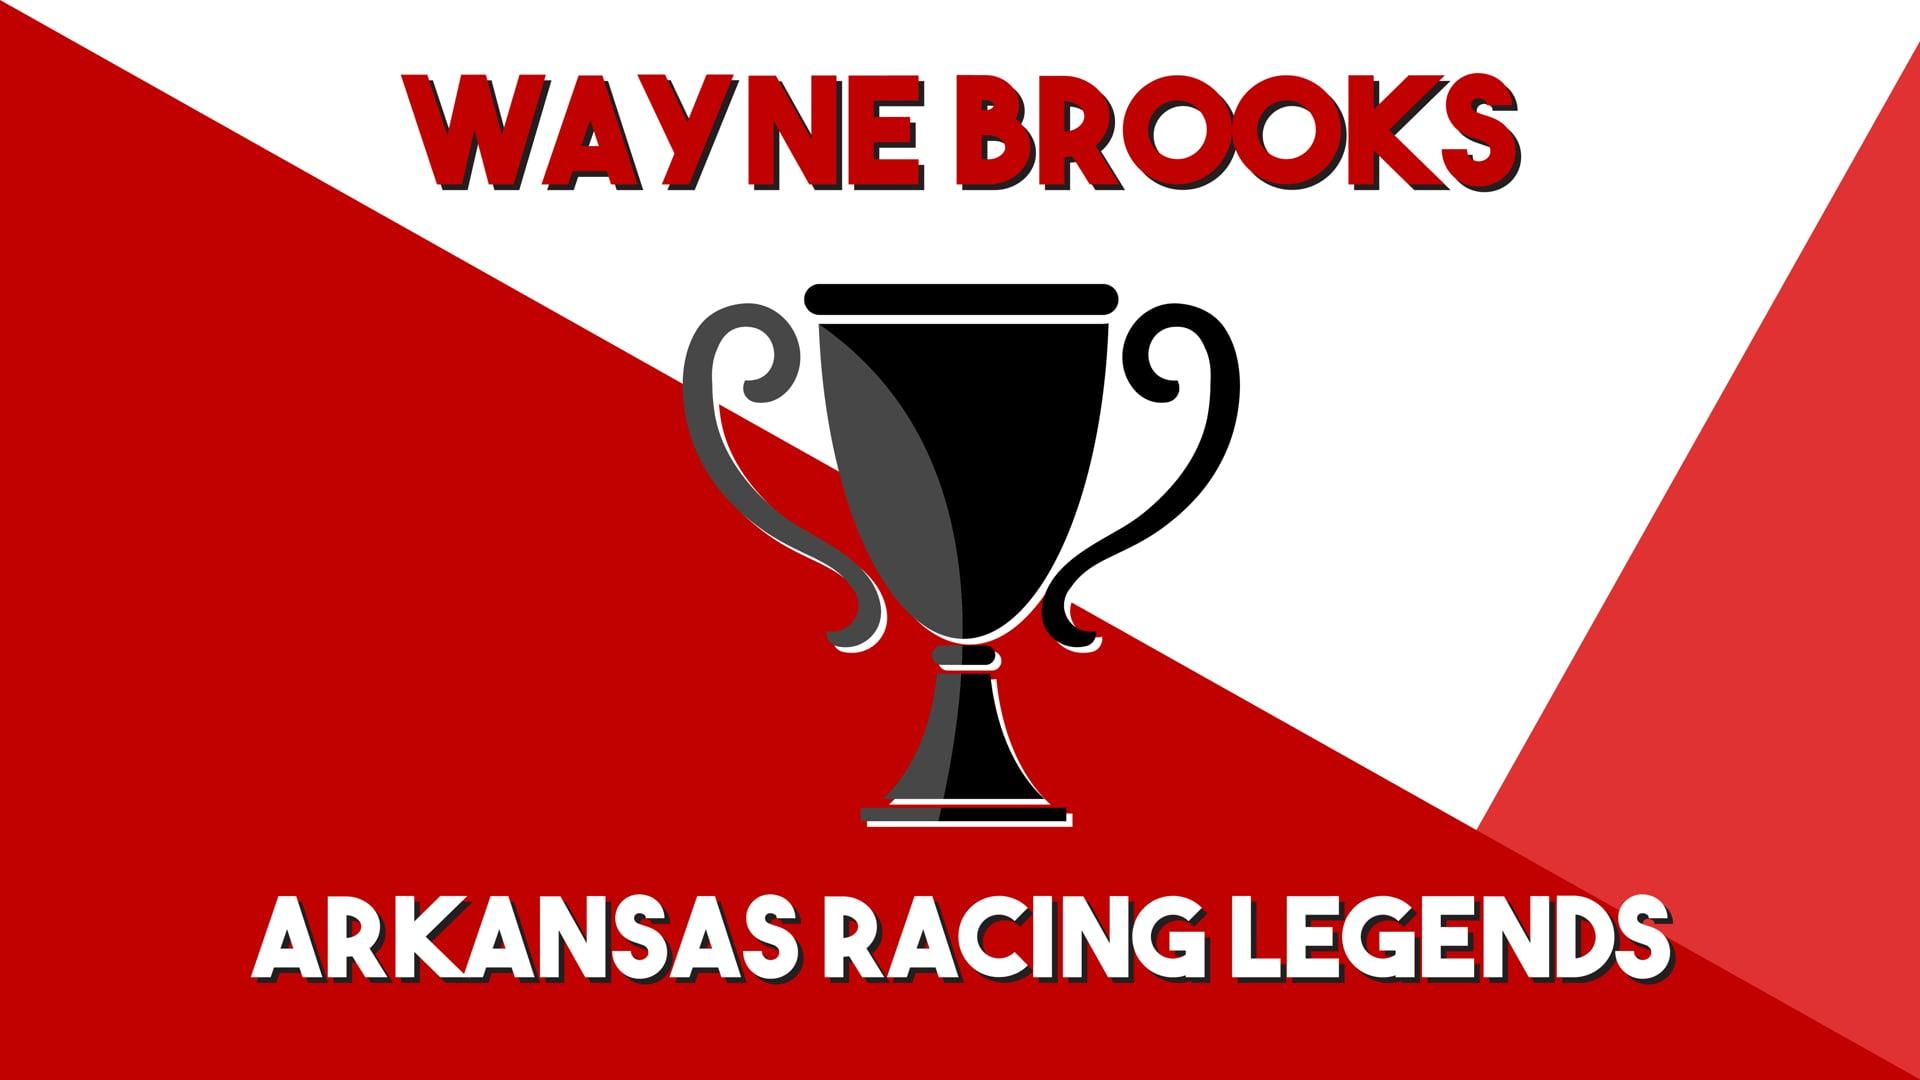 Arkansas Racing Legends